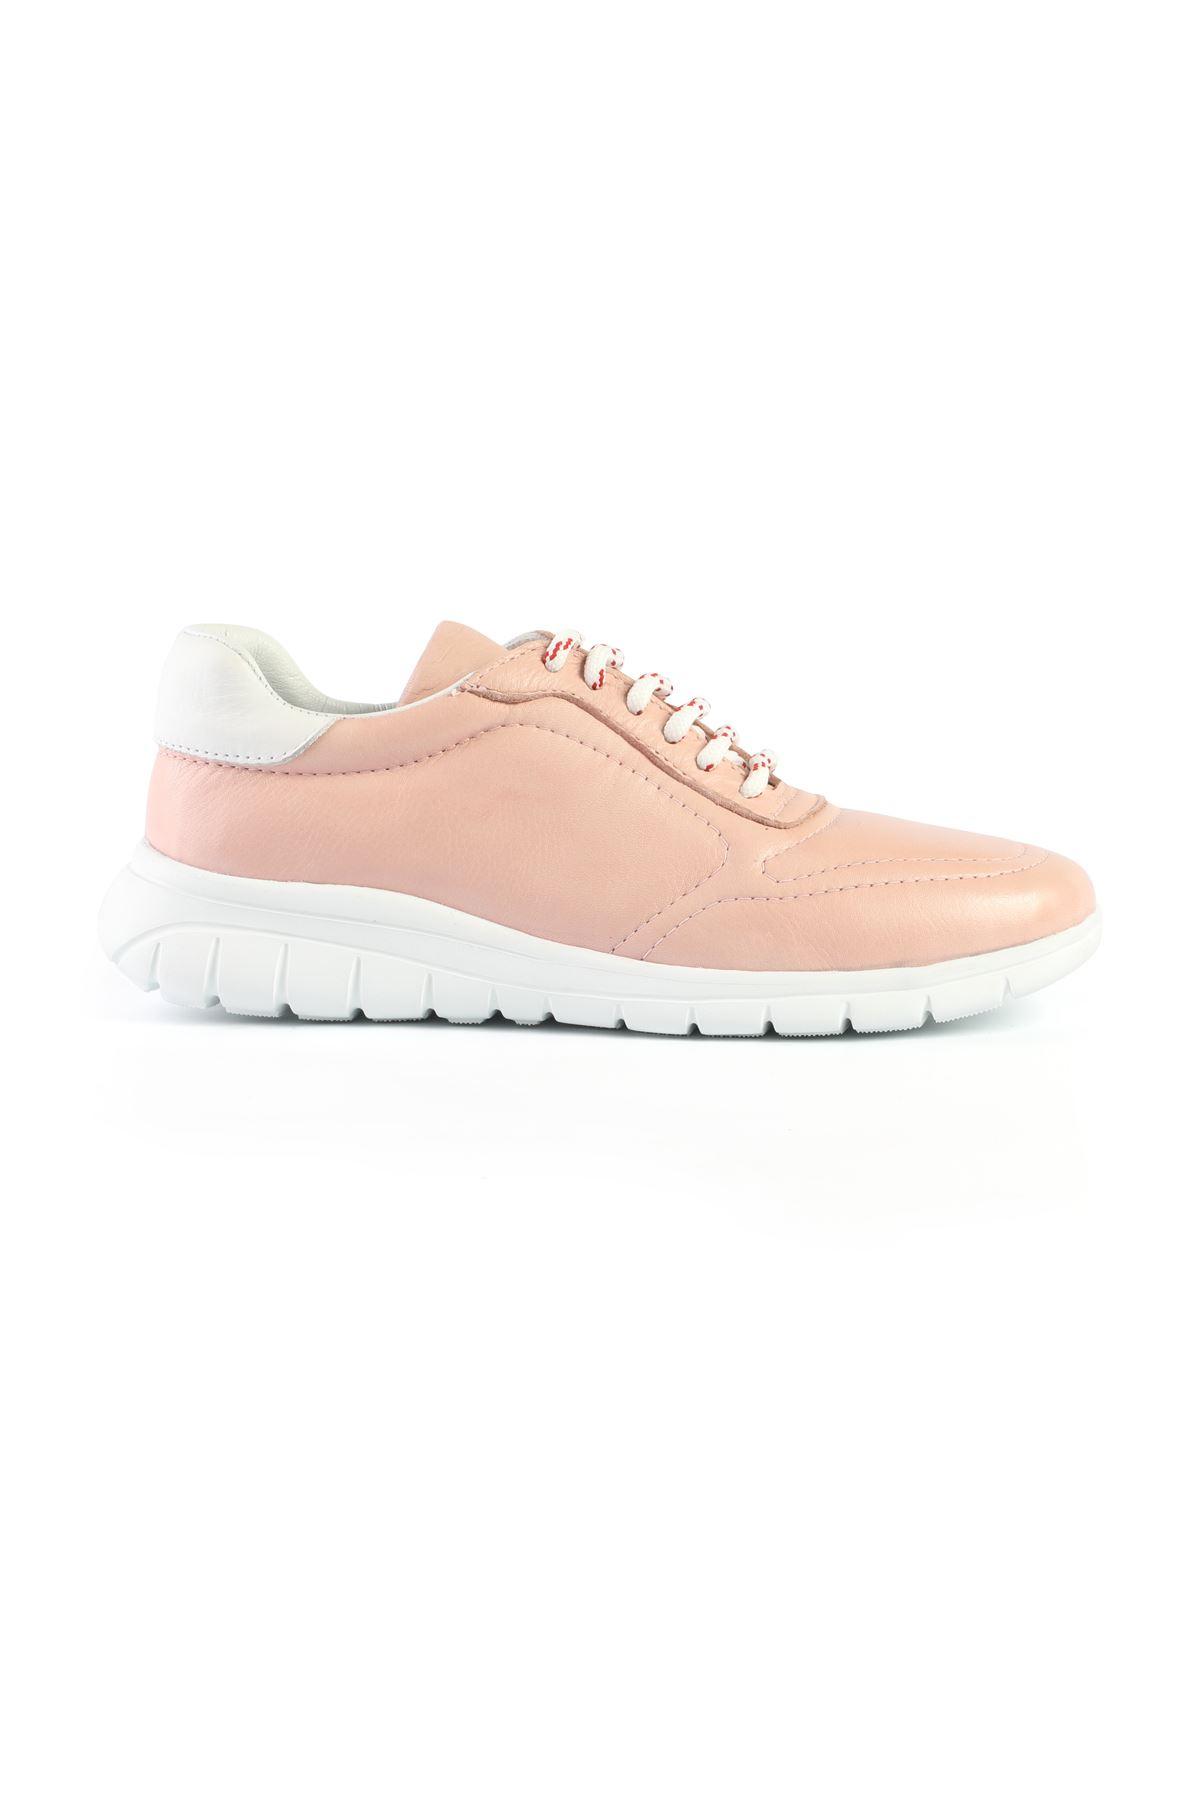 Libero LZ3389 Powder Sport Shoes